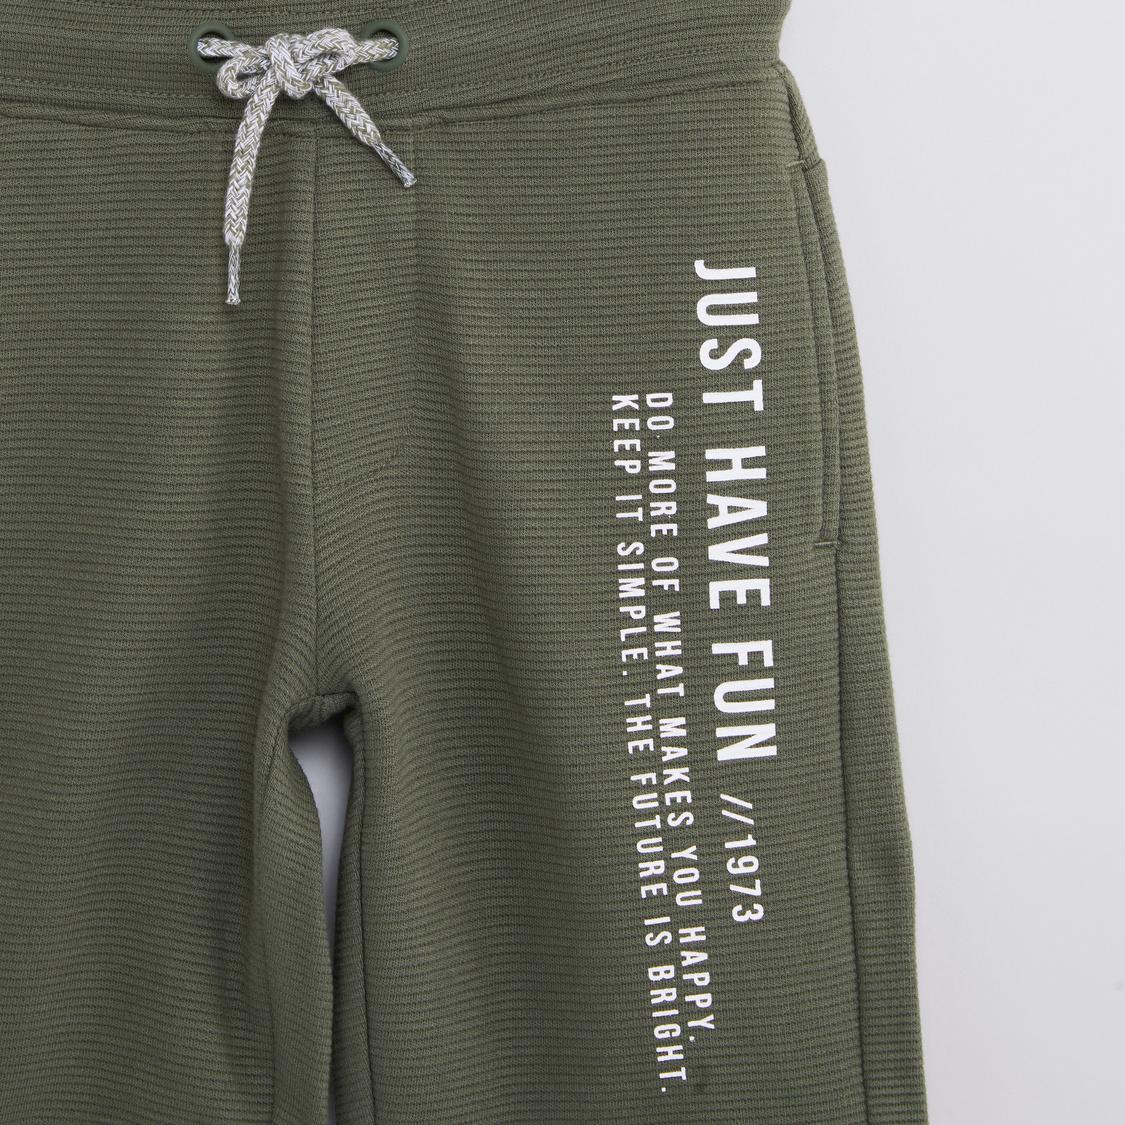 Printed Shorts with Elasticated Drawstring Waistband